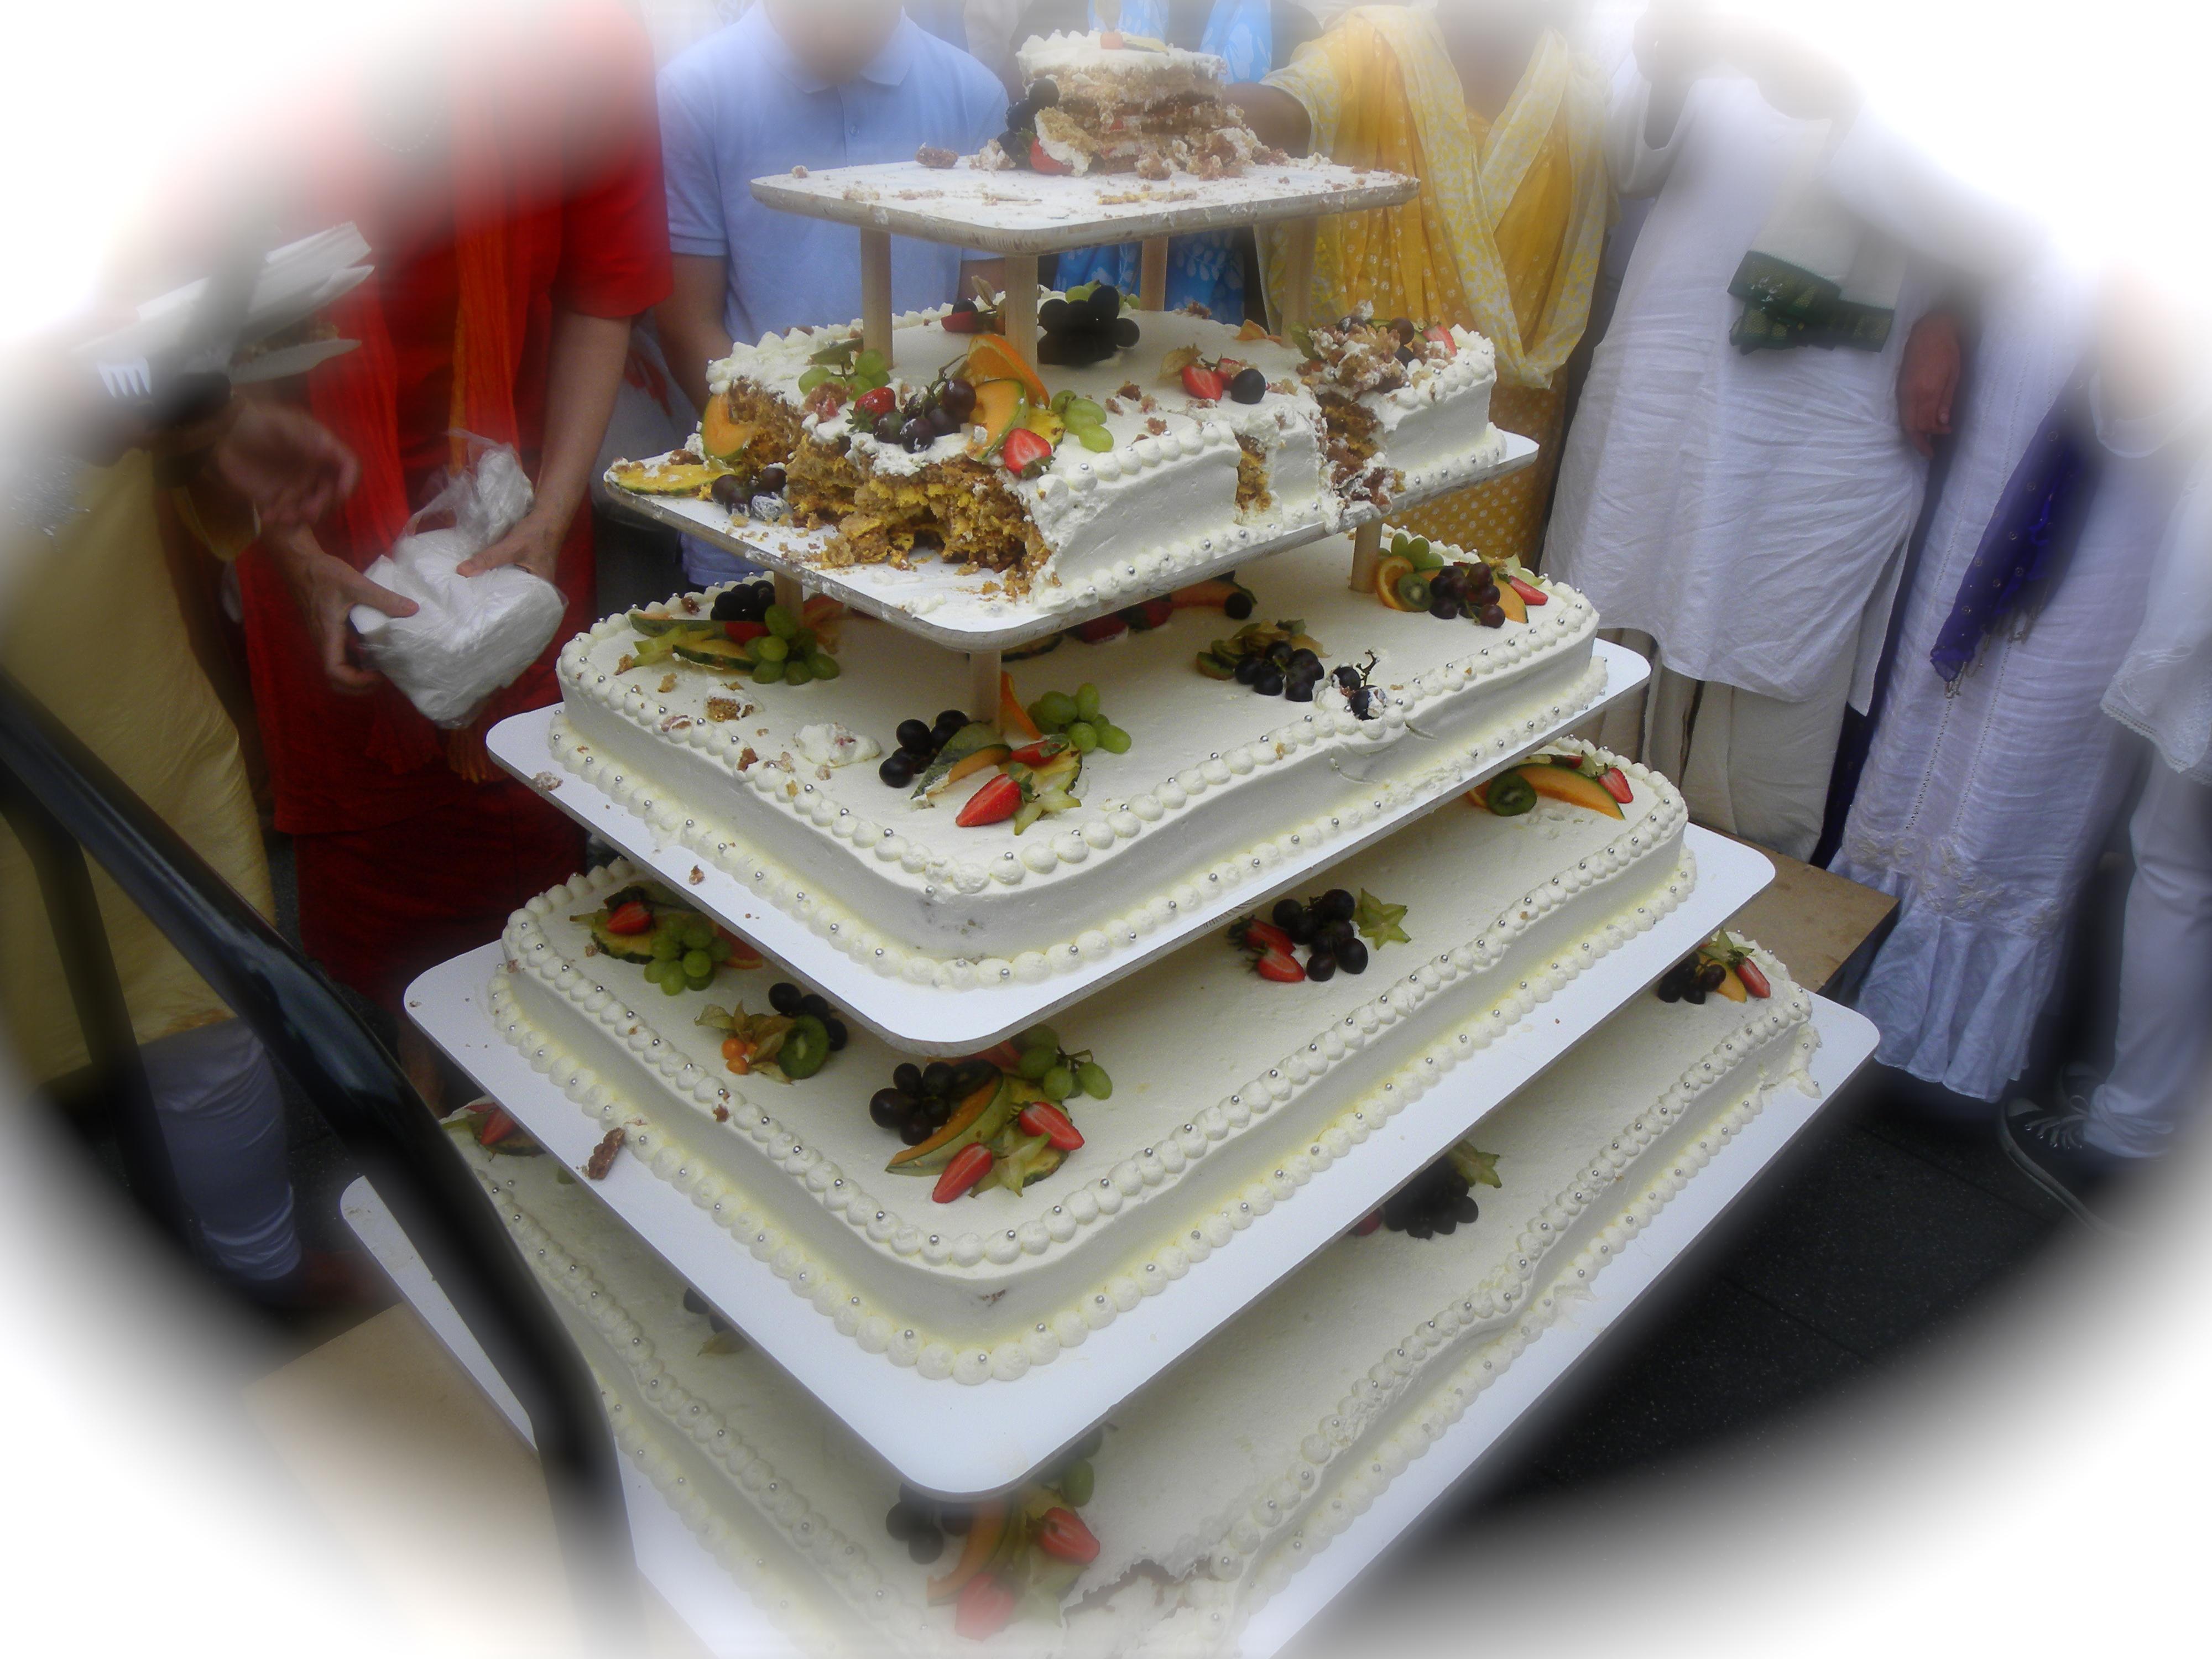 Happy Birthday Wishes Year Ahead ~ Happy birthday to youu2026u2026 kishan poddar